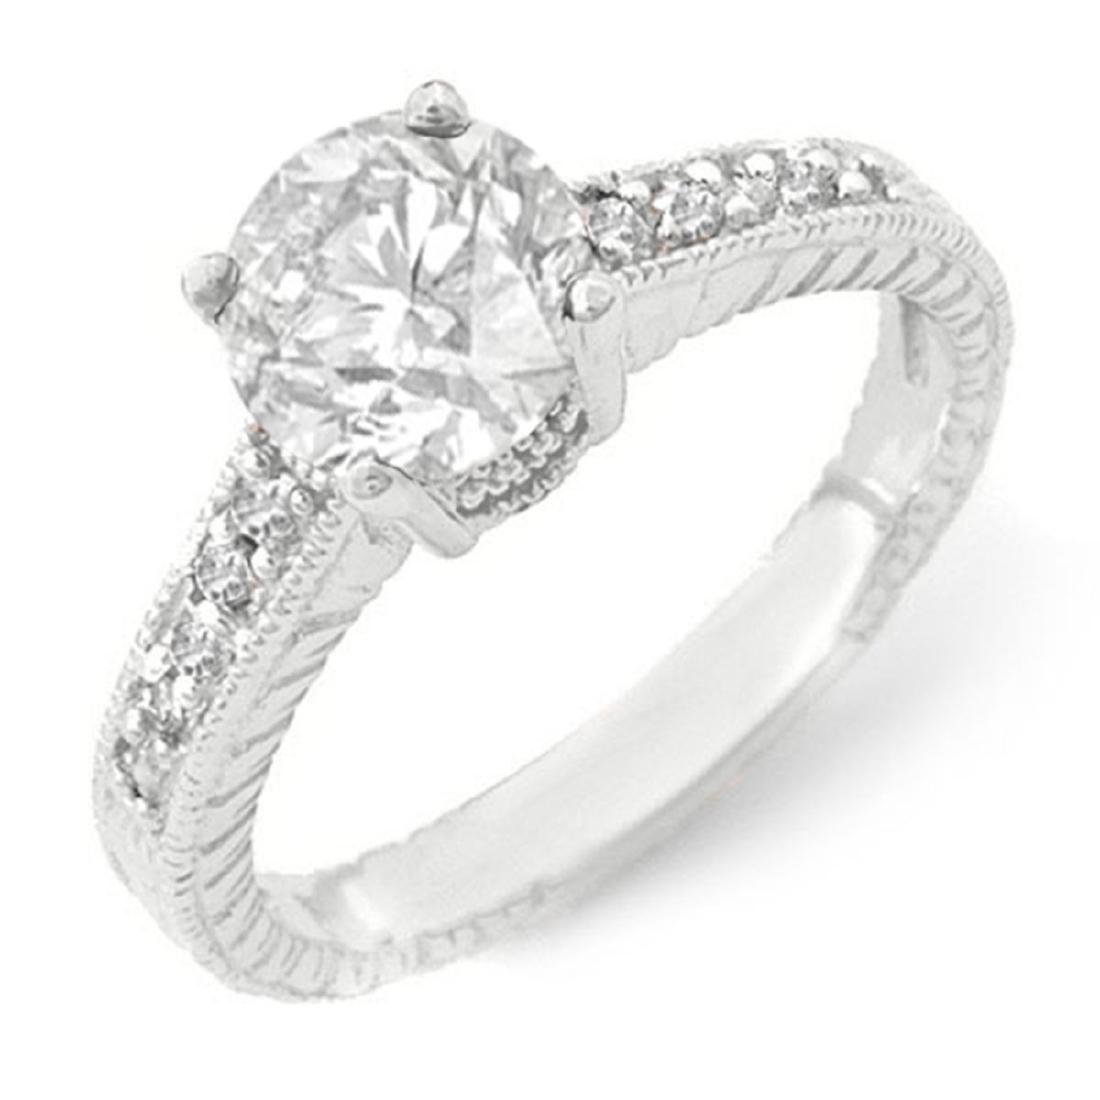 1.05 ctw VS/SI Diamond Solitaire Ring 18K White Gold -